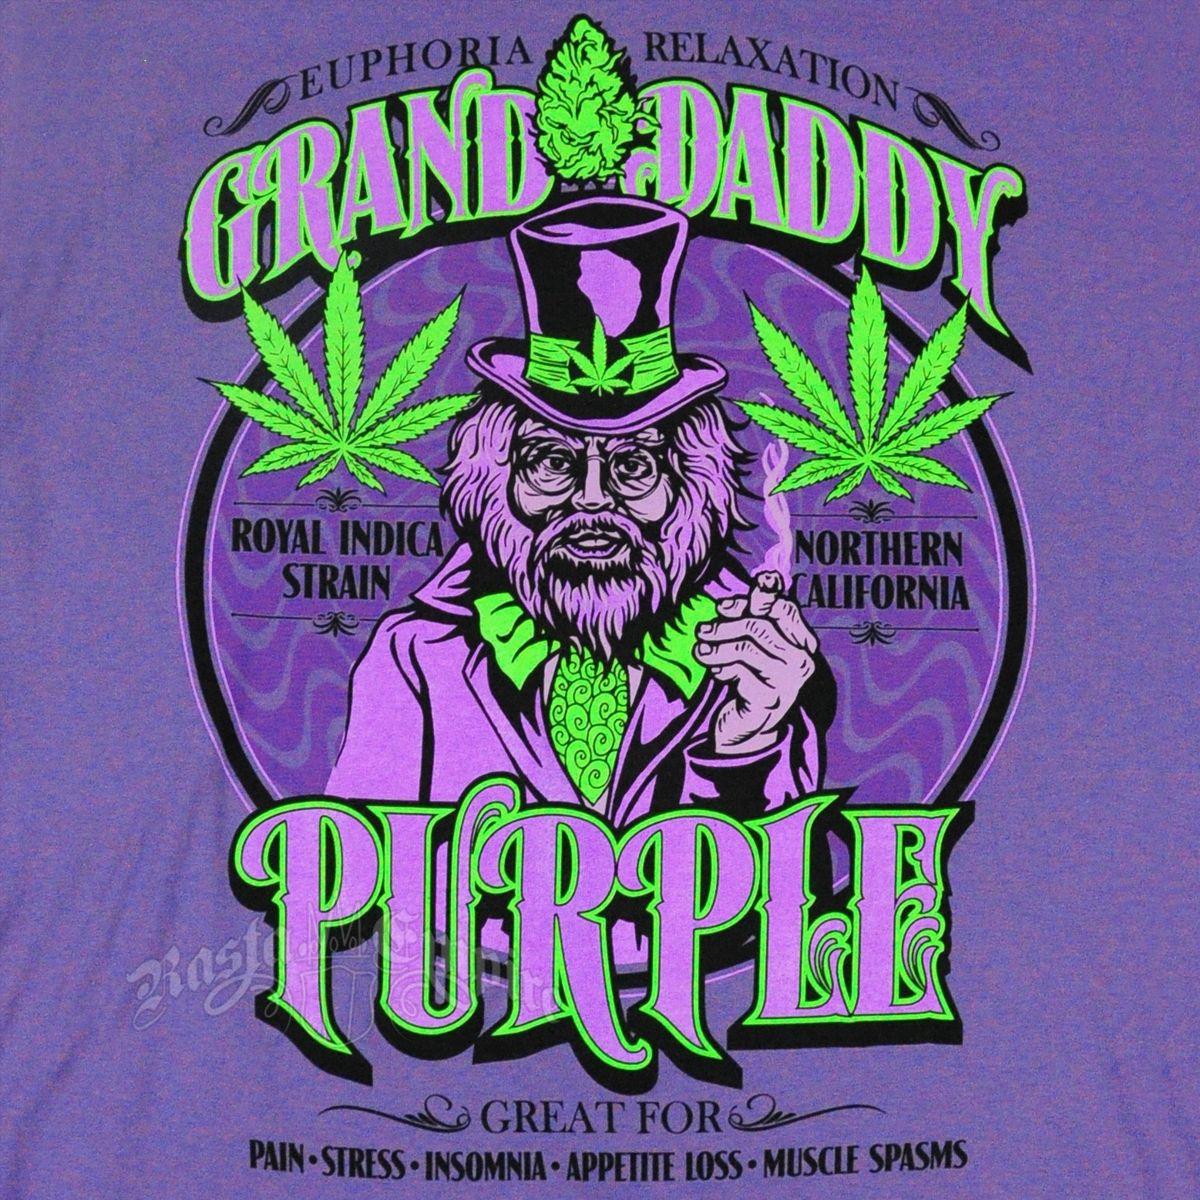 Black light t shirt ideas - Rastaempire Granddaddy Purple Strain Black Light Purple T Shirt